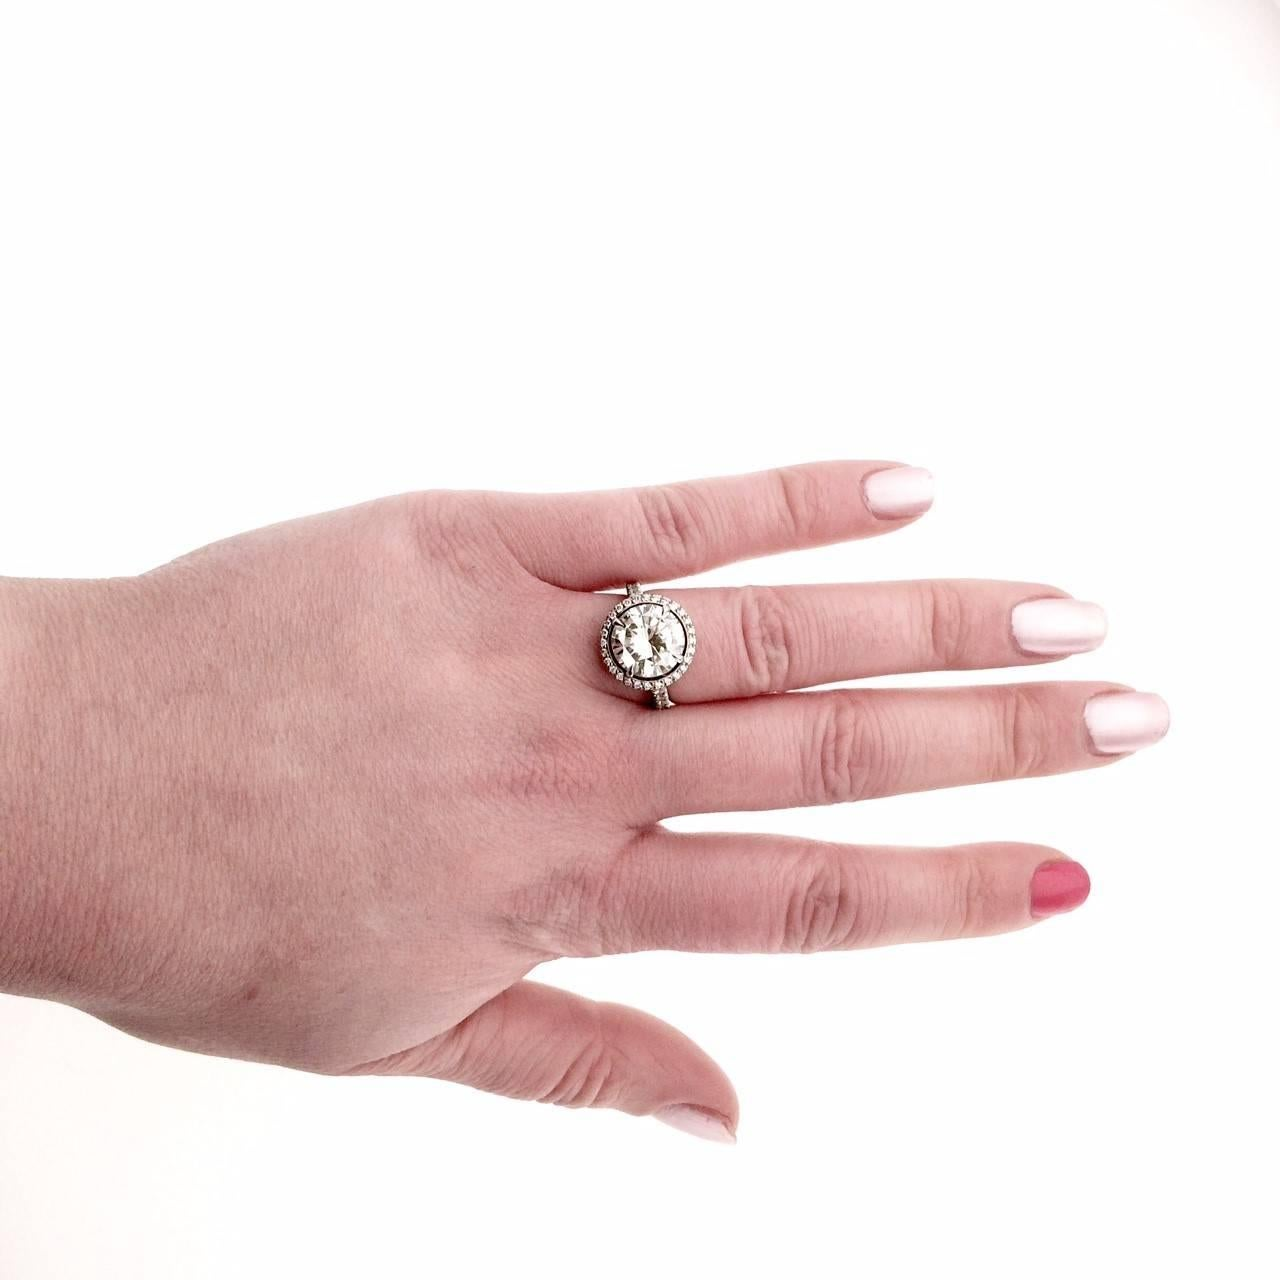 3.75 Carat Diamond Platinum Cluster Engagement Ring For Sale at 1stdibs